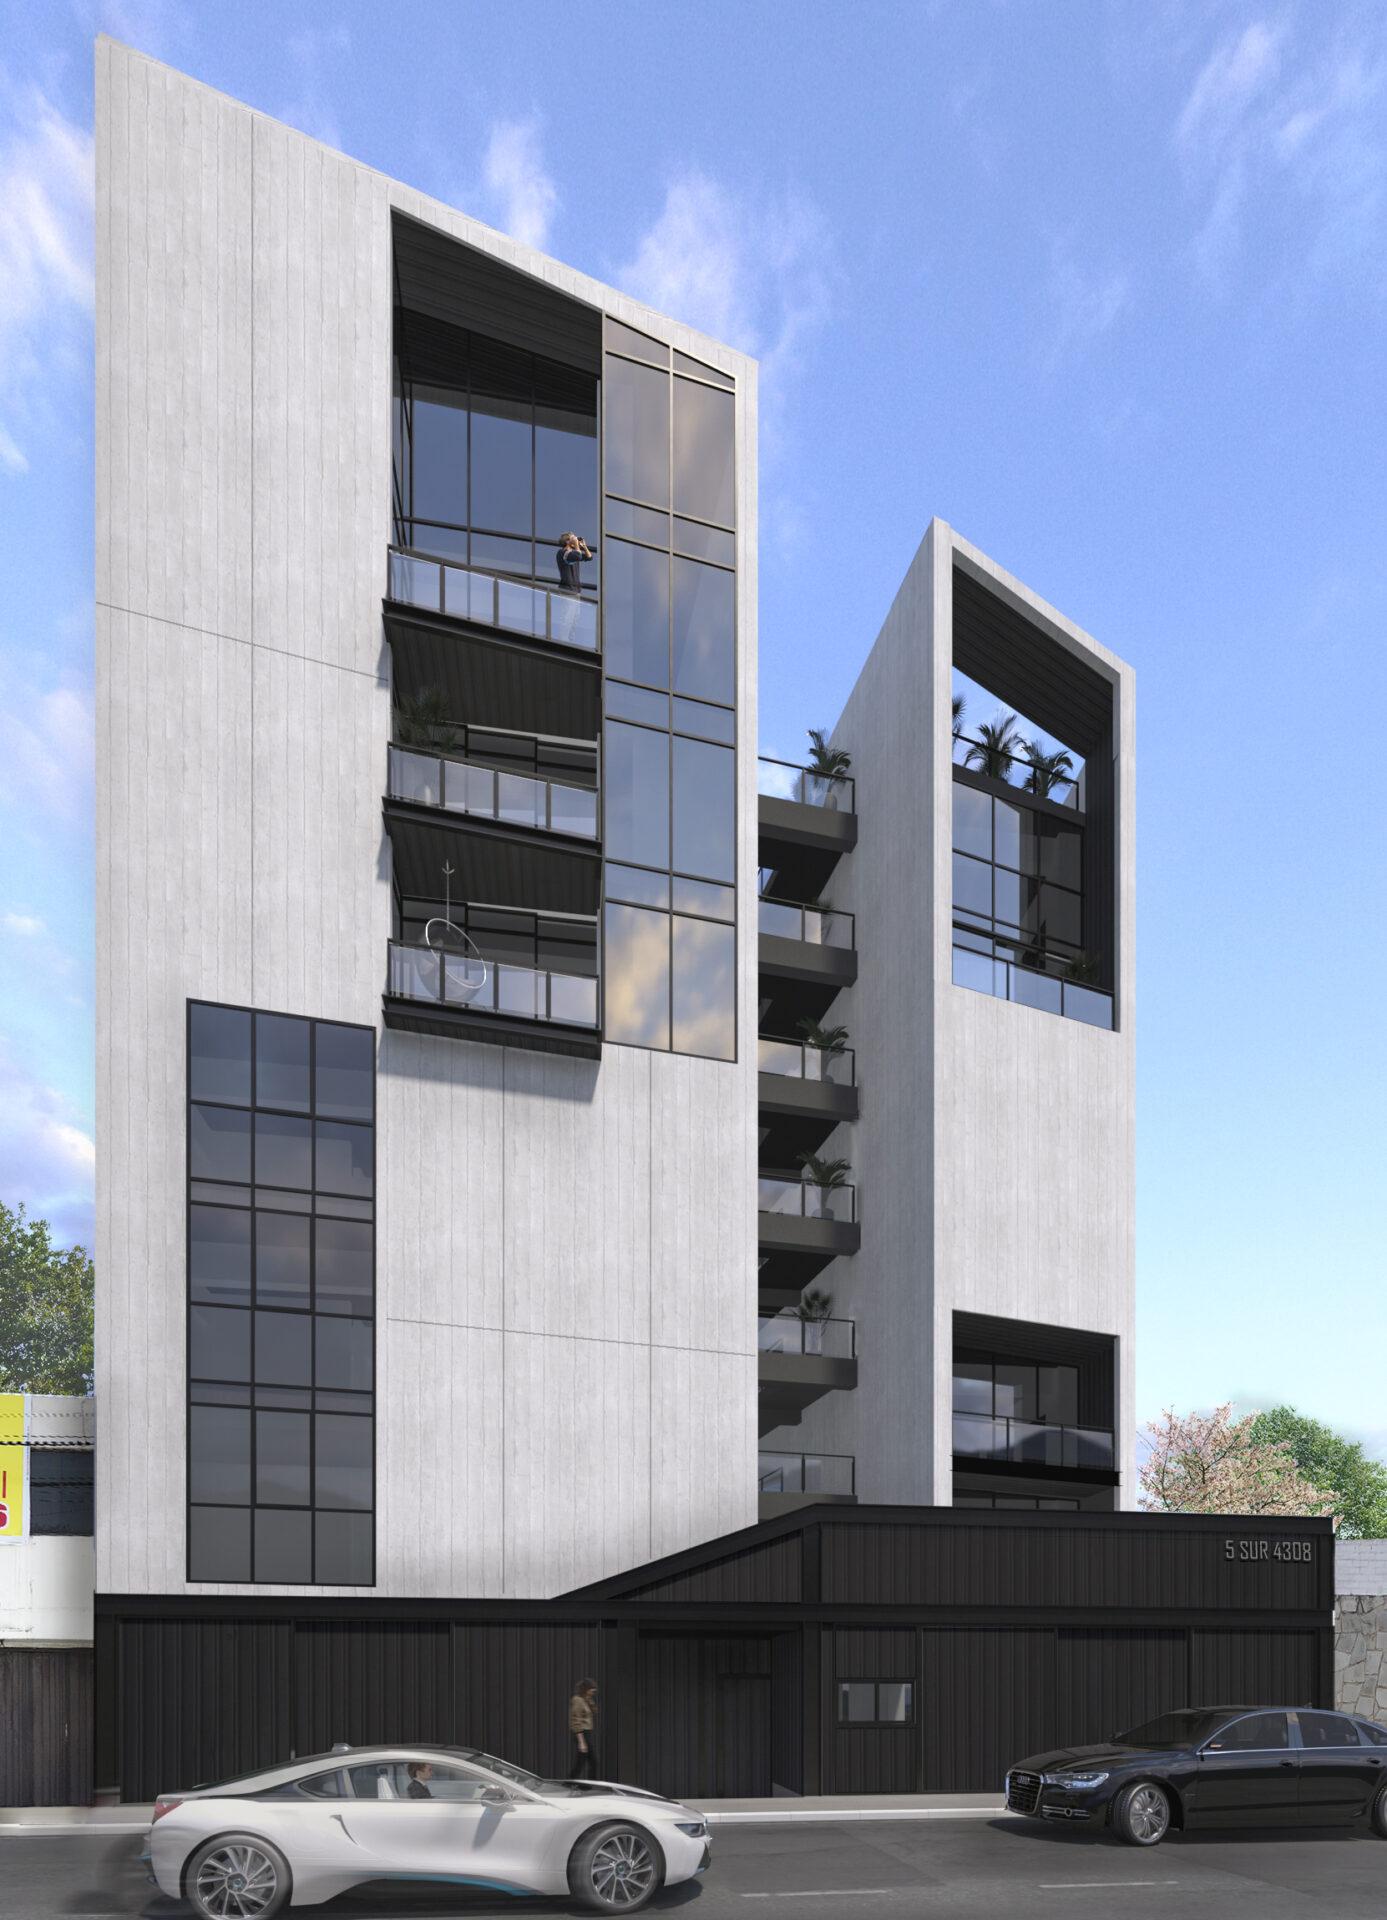 Huexotitla Tower